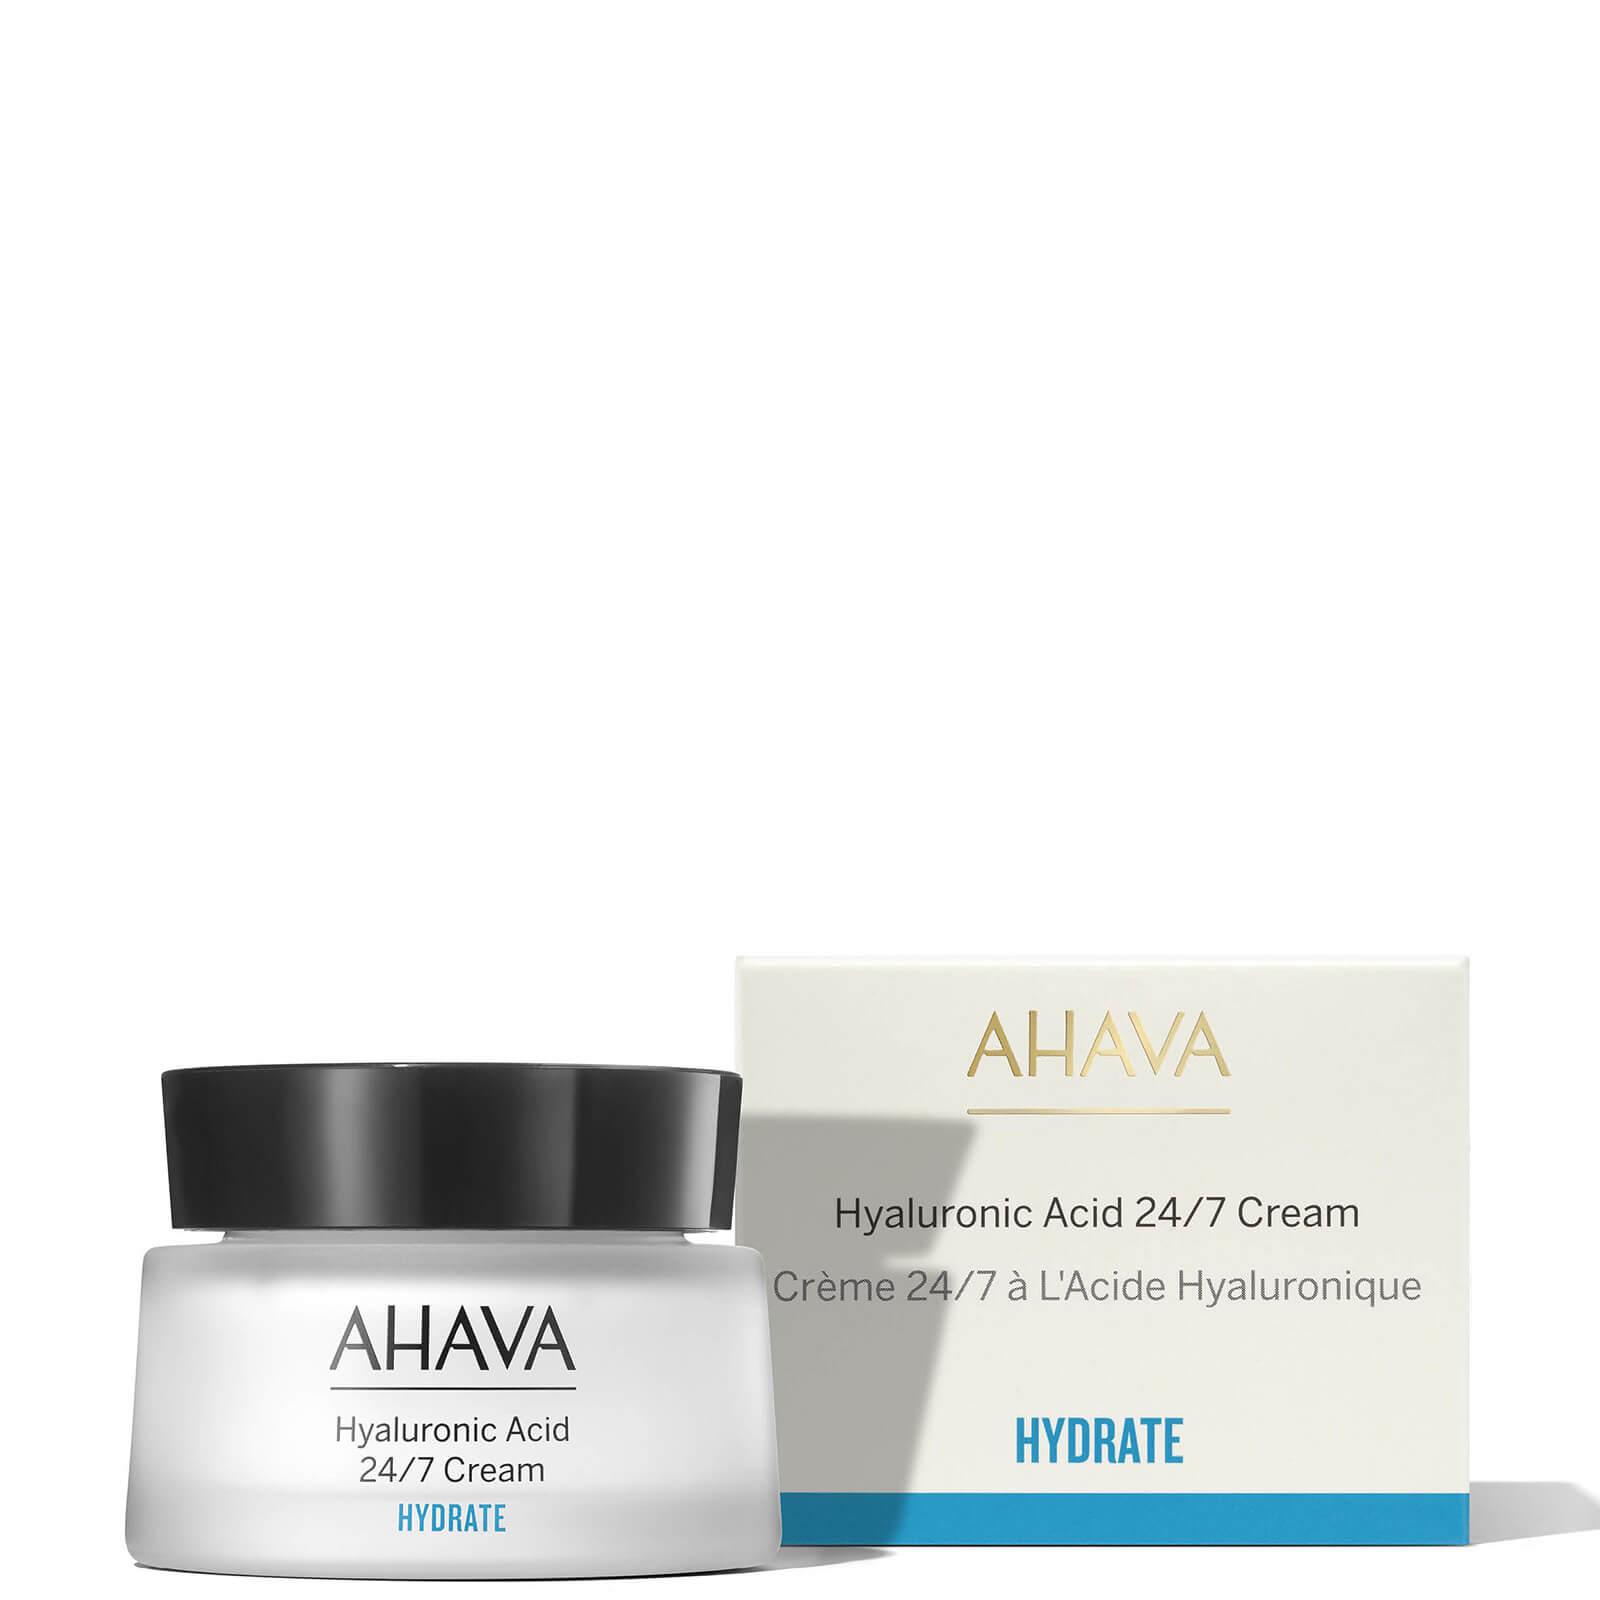 Купить AHAVA Hyaluronic Acid 24/7 Cream 50ml